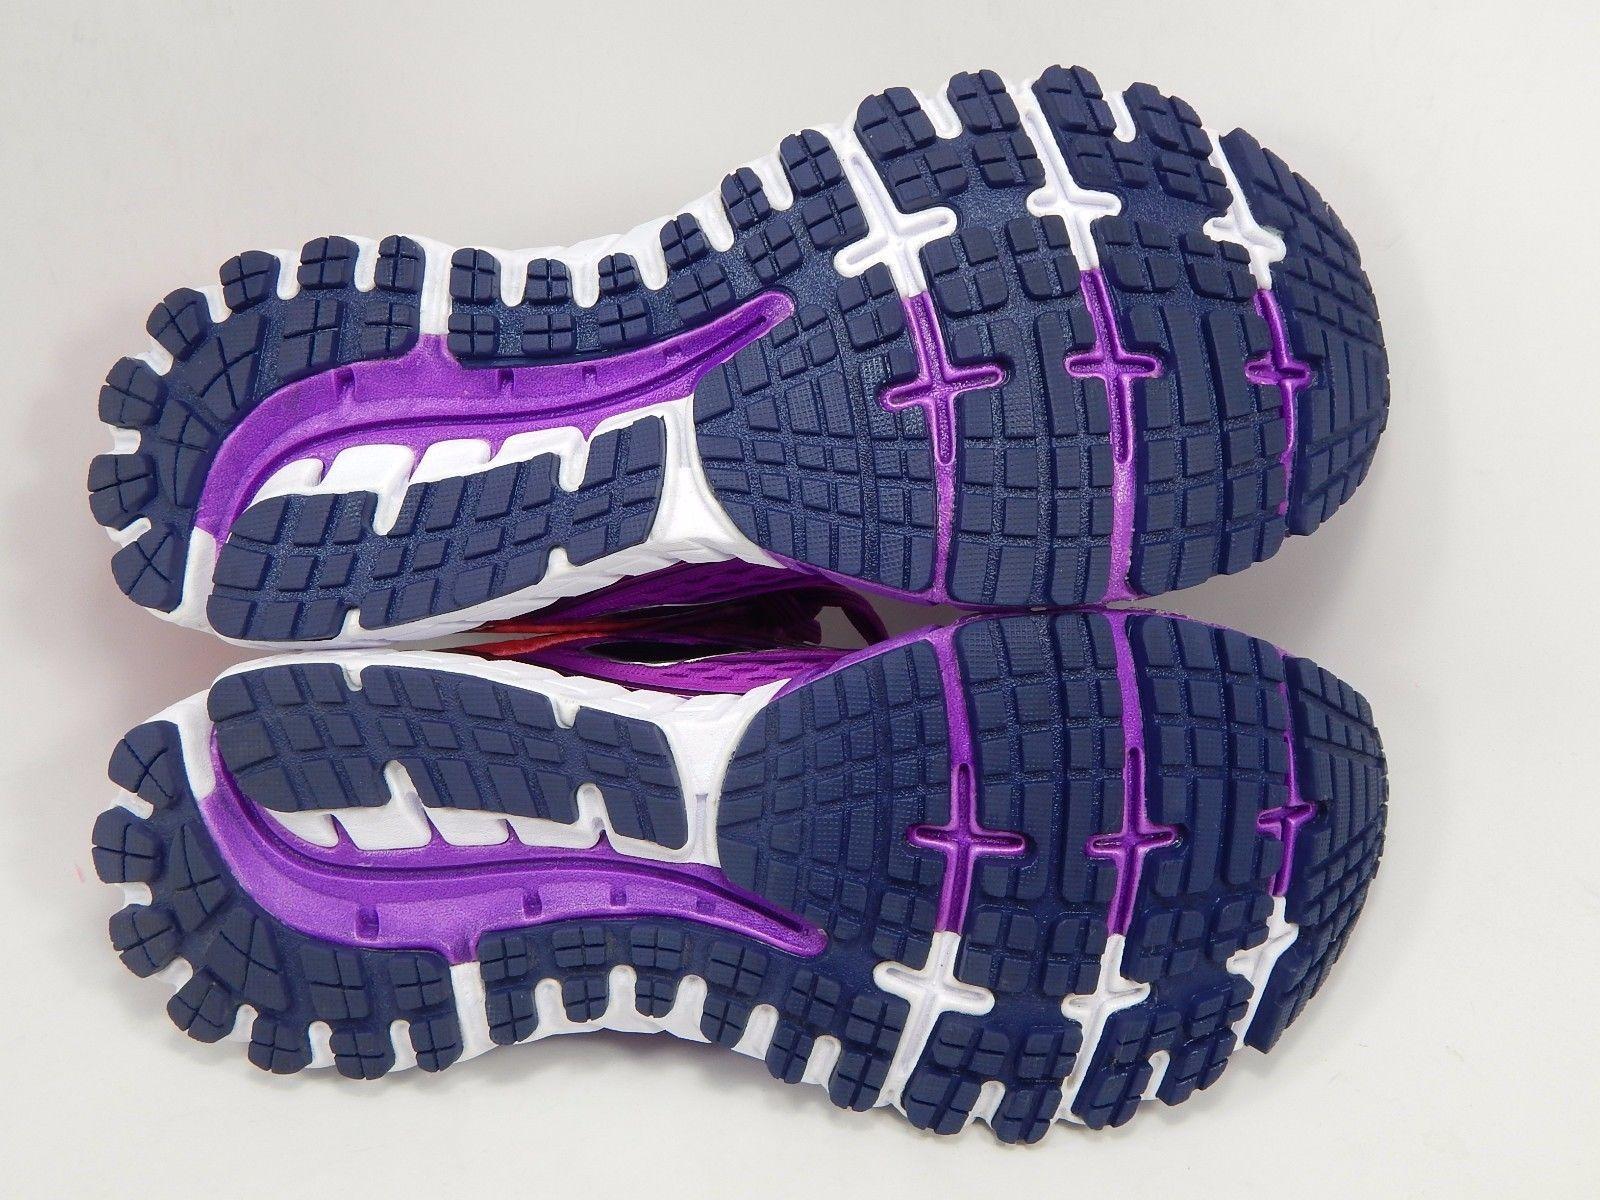 055c6d359a8 Brooks Ghost 9 Women s Running Shoes Size US 10 M (B) EU 42 Purple